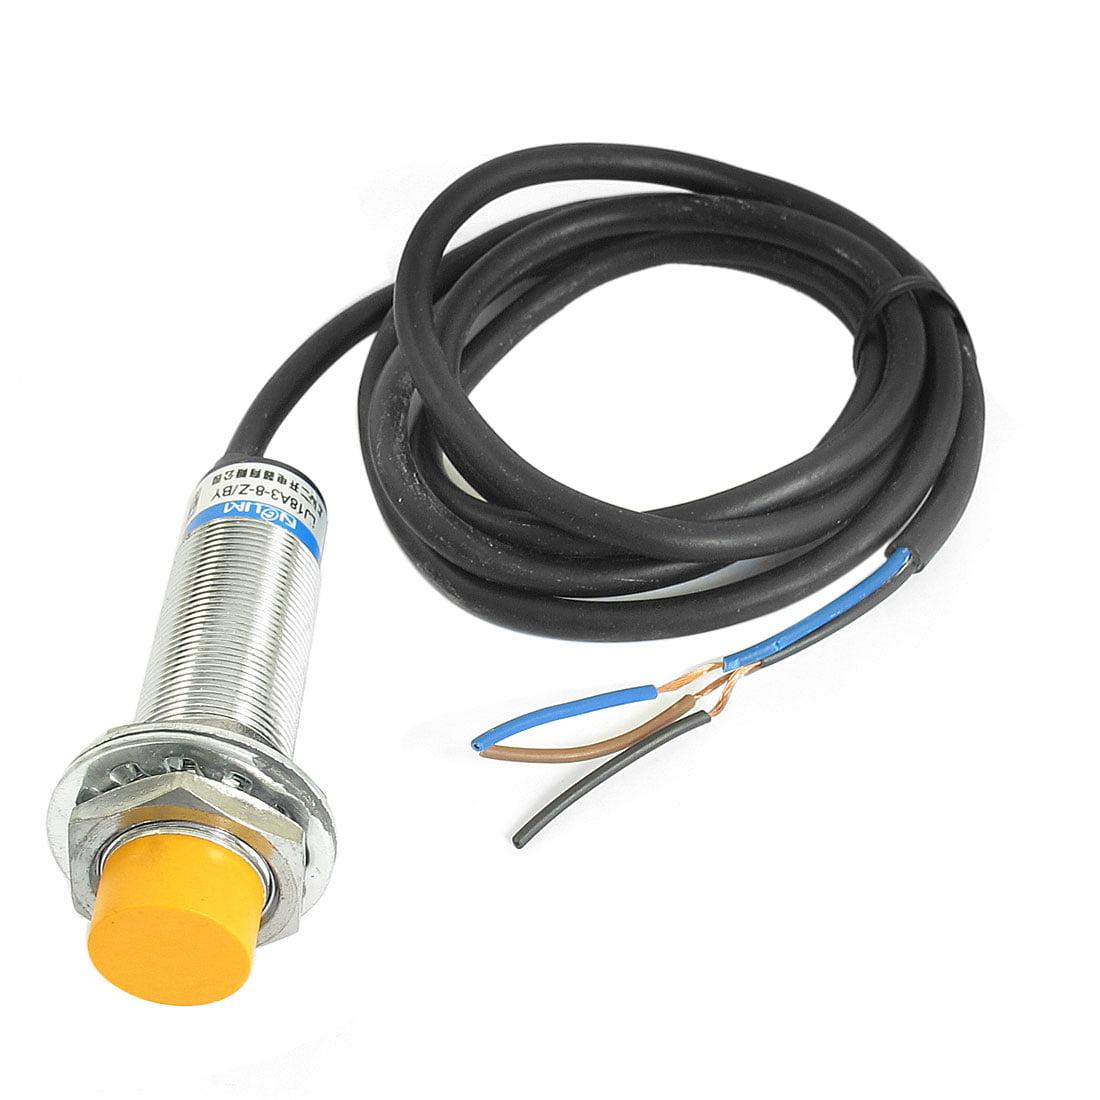 DC 6-36V PNP NO 8mm Inductive Proximity Sensor Detection Switch LJ18A3-8-Z/BY